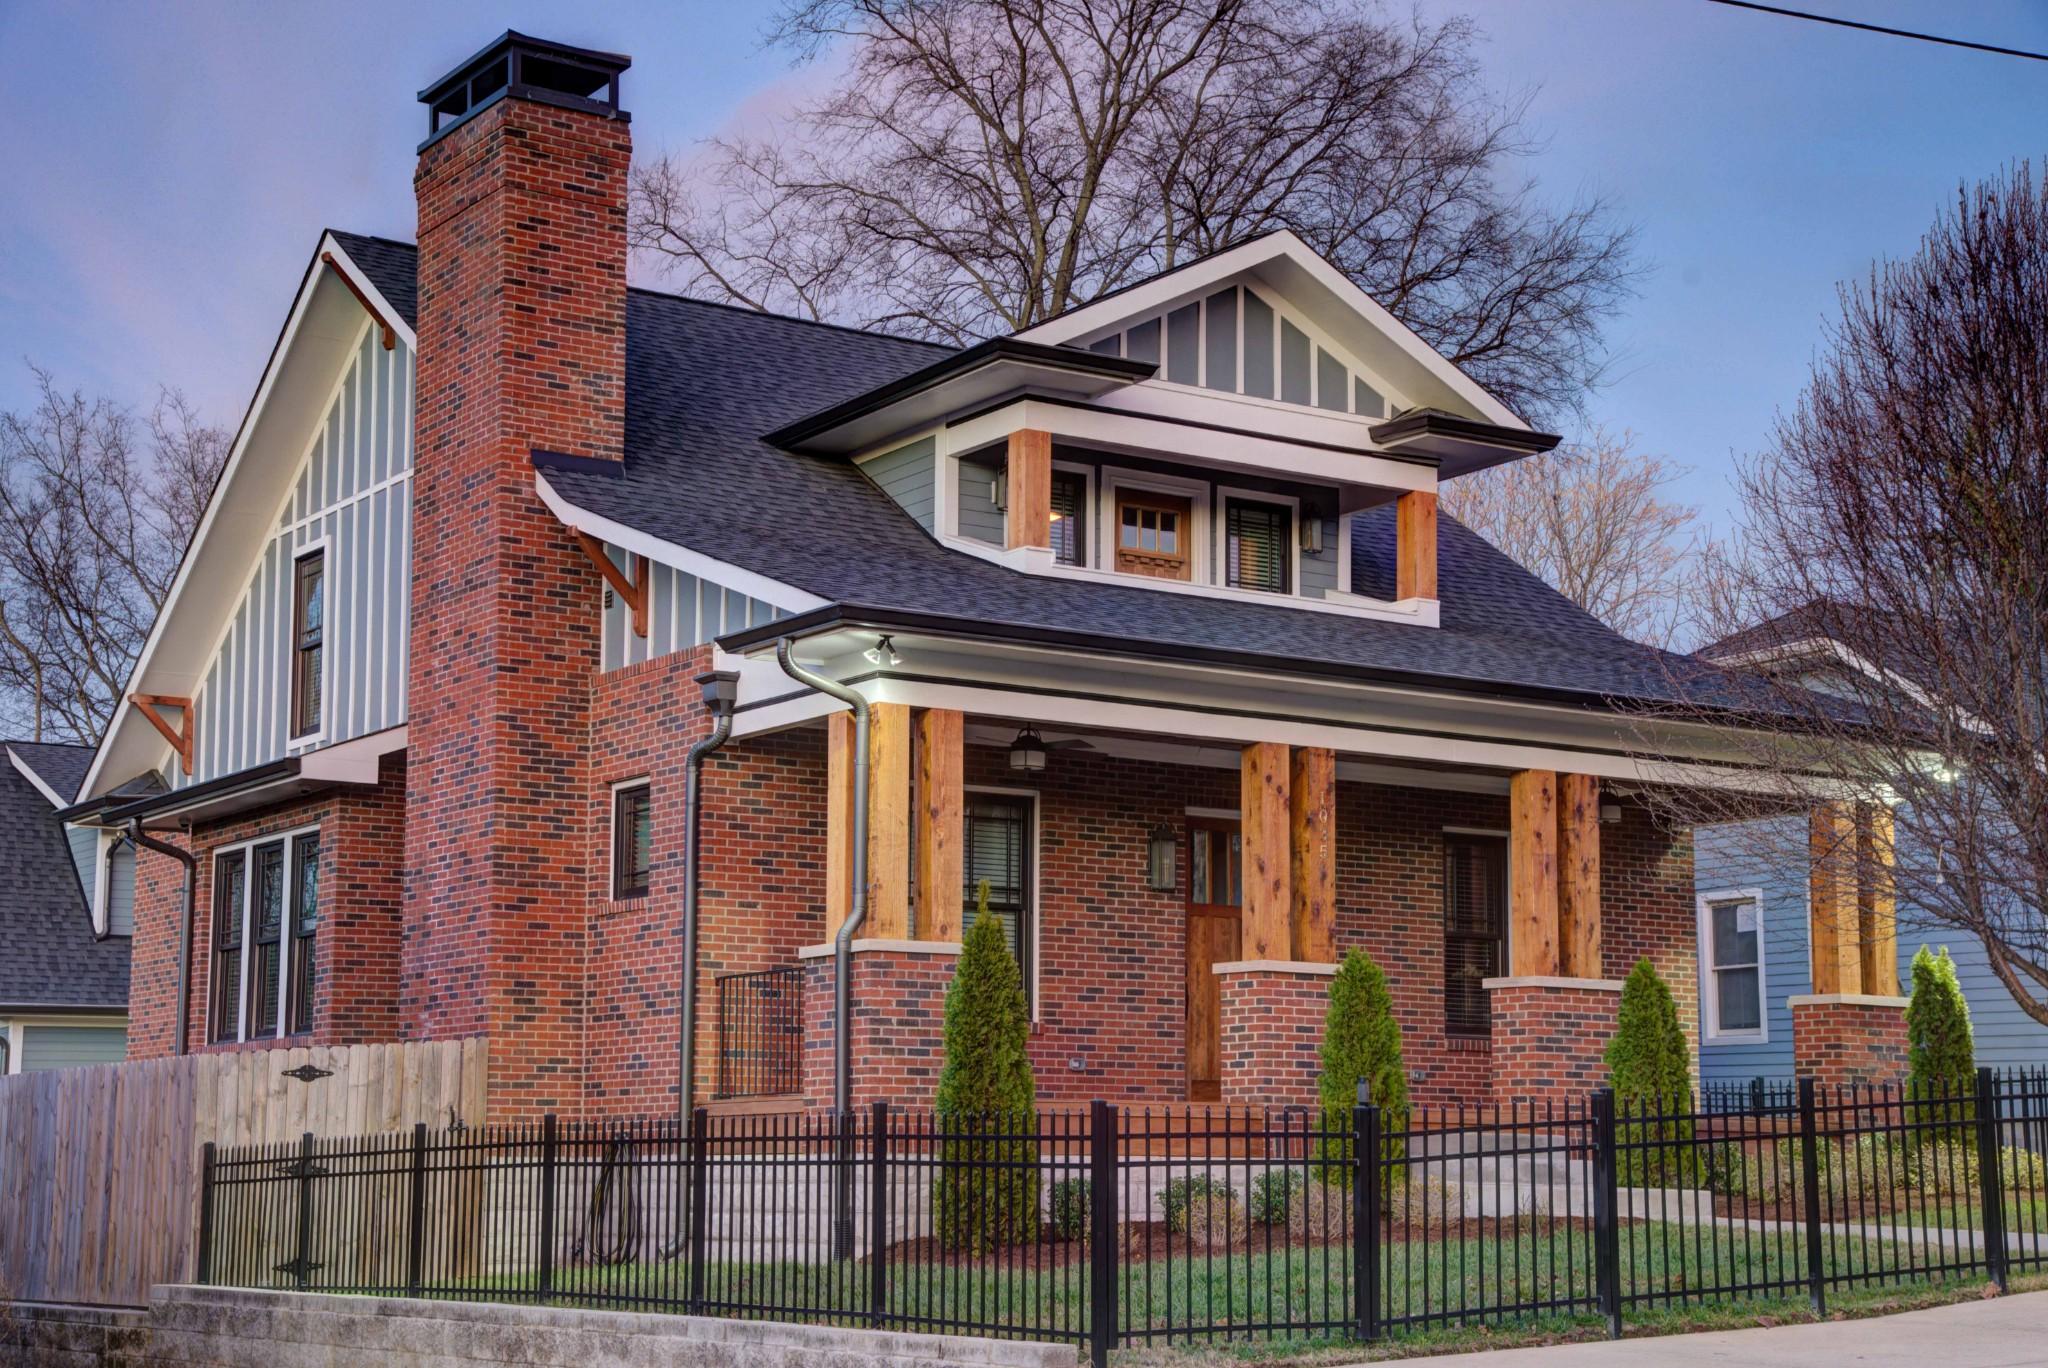 1035 Chicamauga Ave, Nashville, TN 37206 - Nashville, TN real estate listing